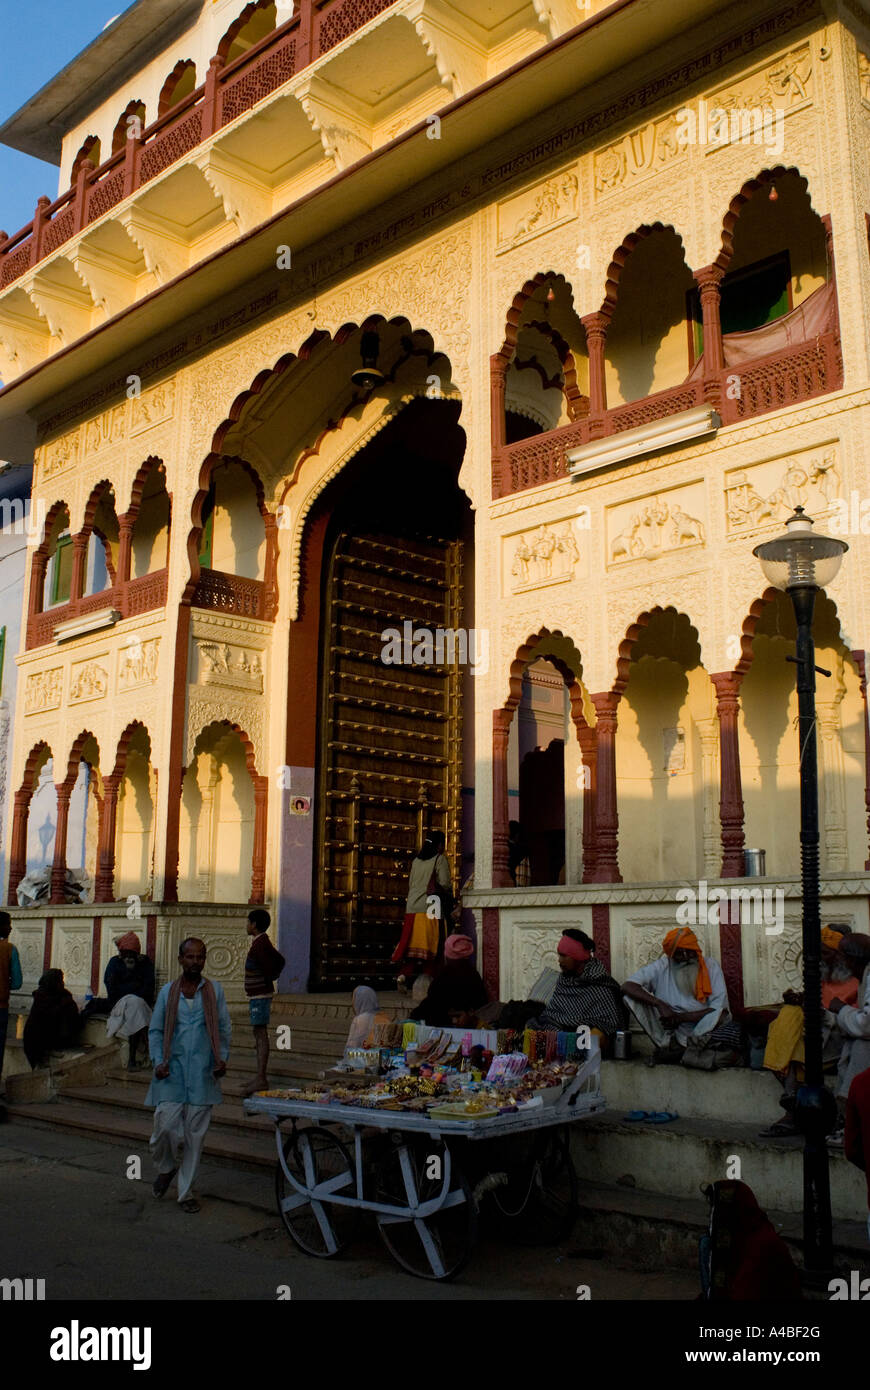 Image de temple hindou à Pushkar Photo Stock